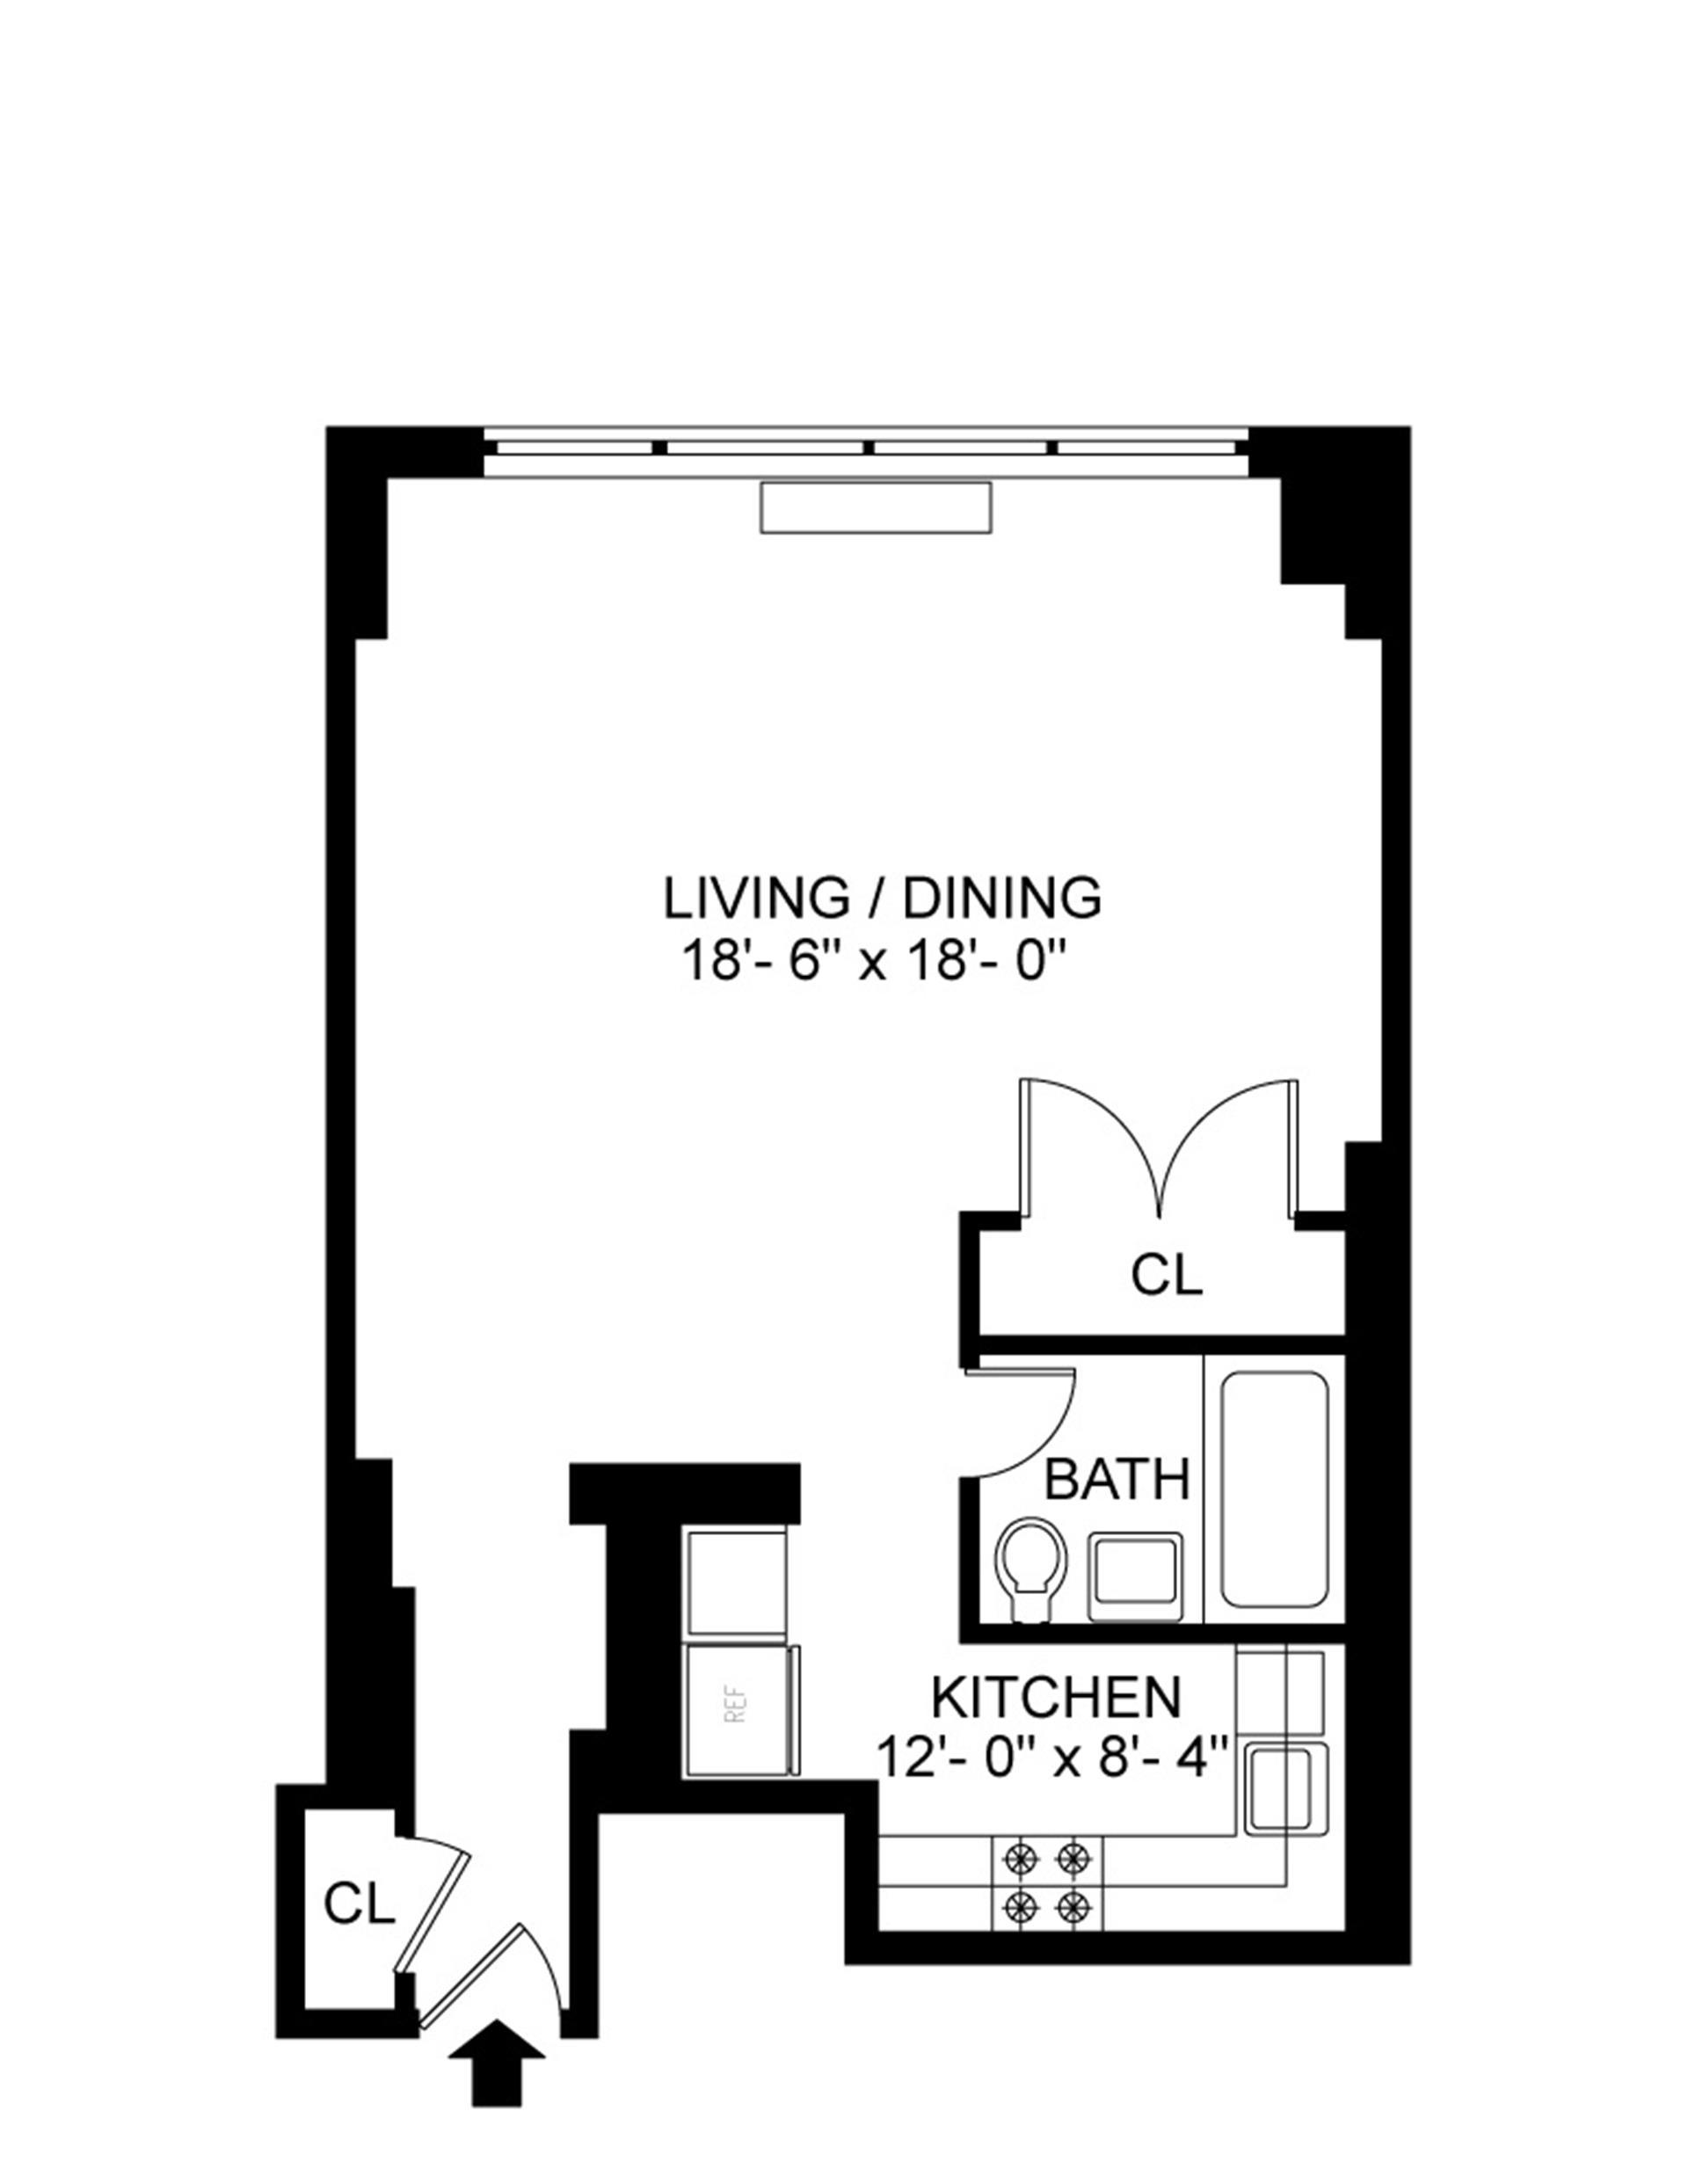 Floor plan of 201 West 21st Street, 4B - Chelsea, New York